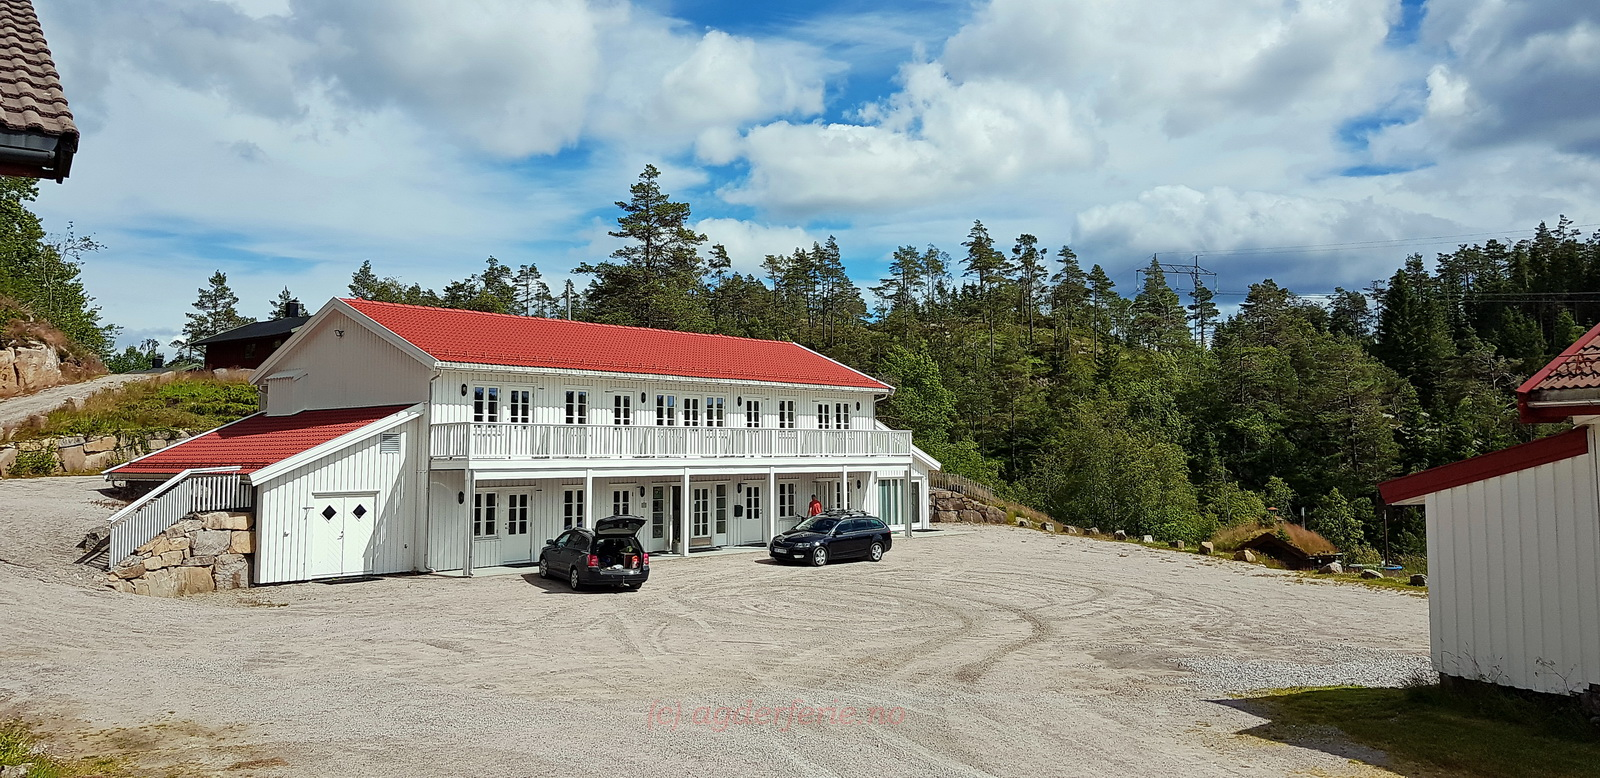 1104 Undeland gård, Kvås i Lyngdal